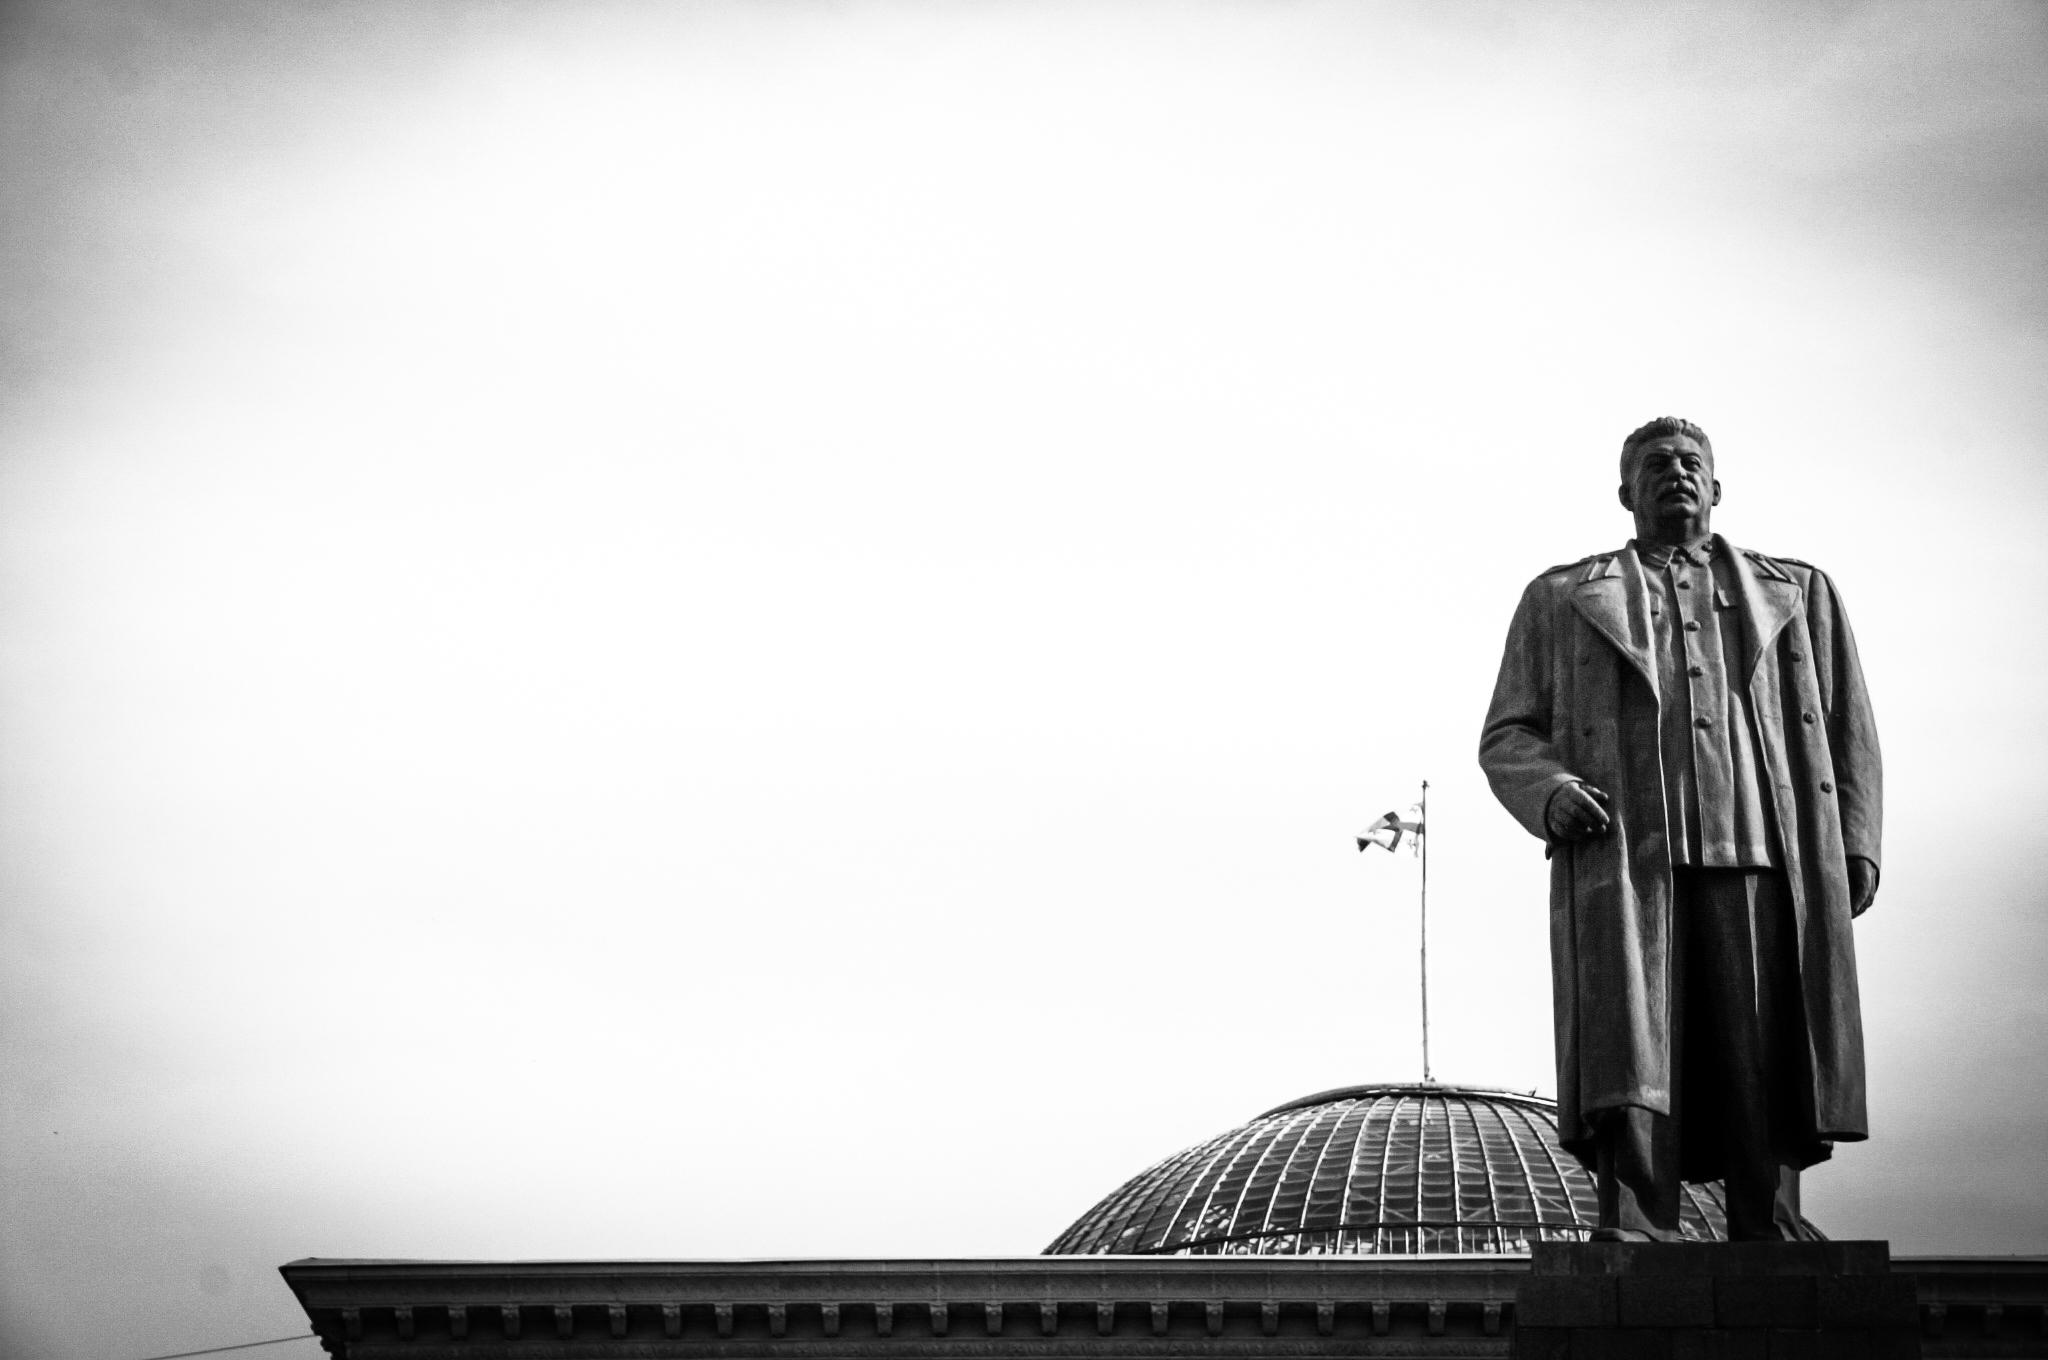 Statue of Joseph Statlin